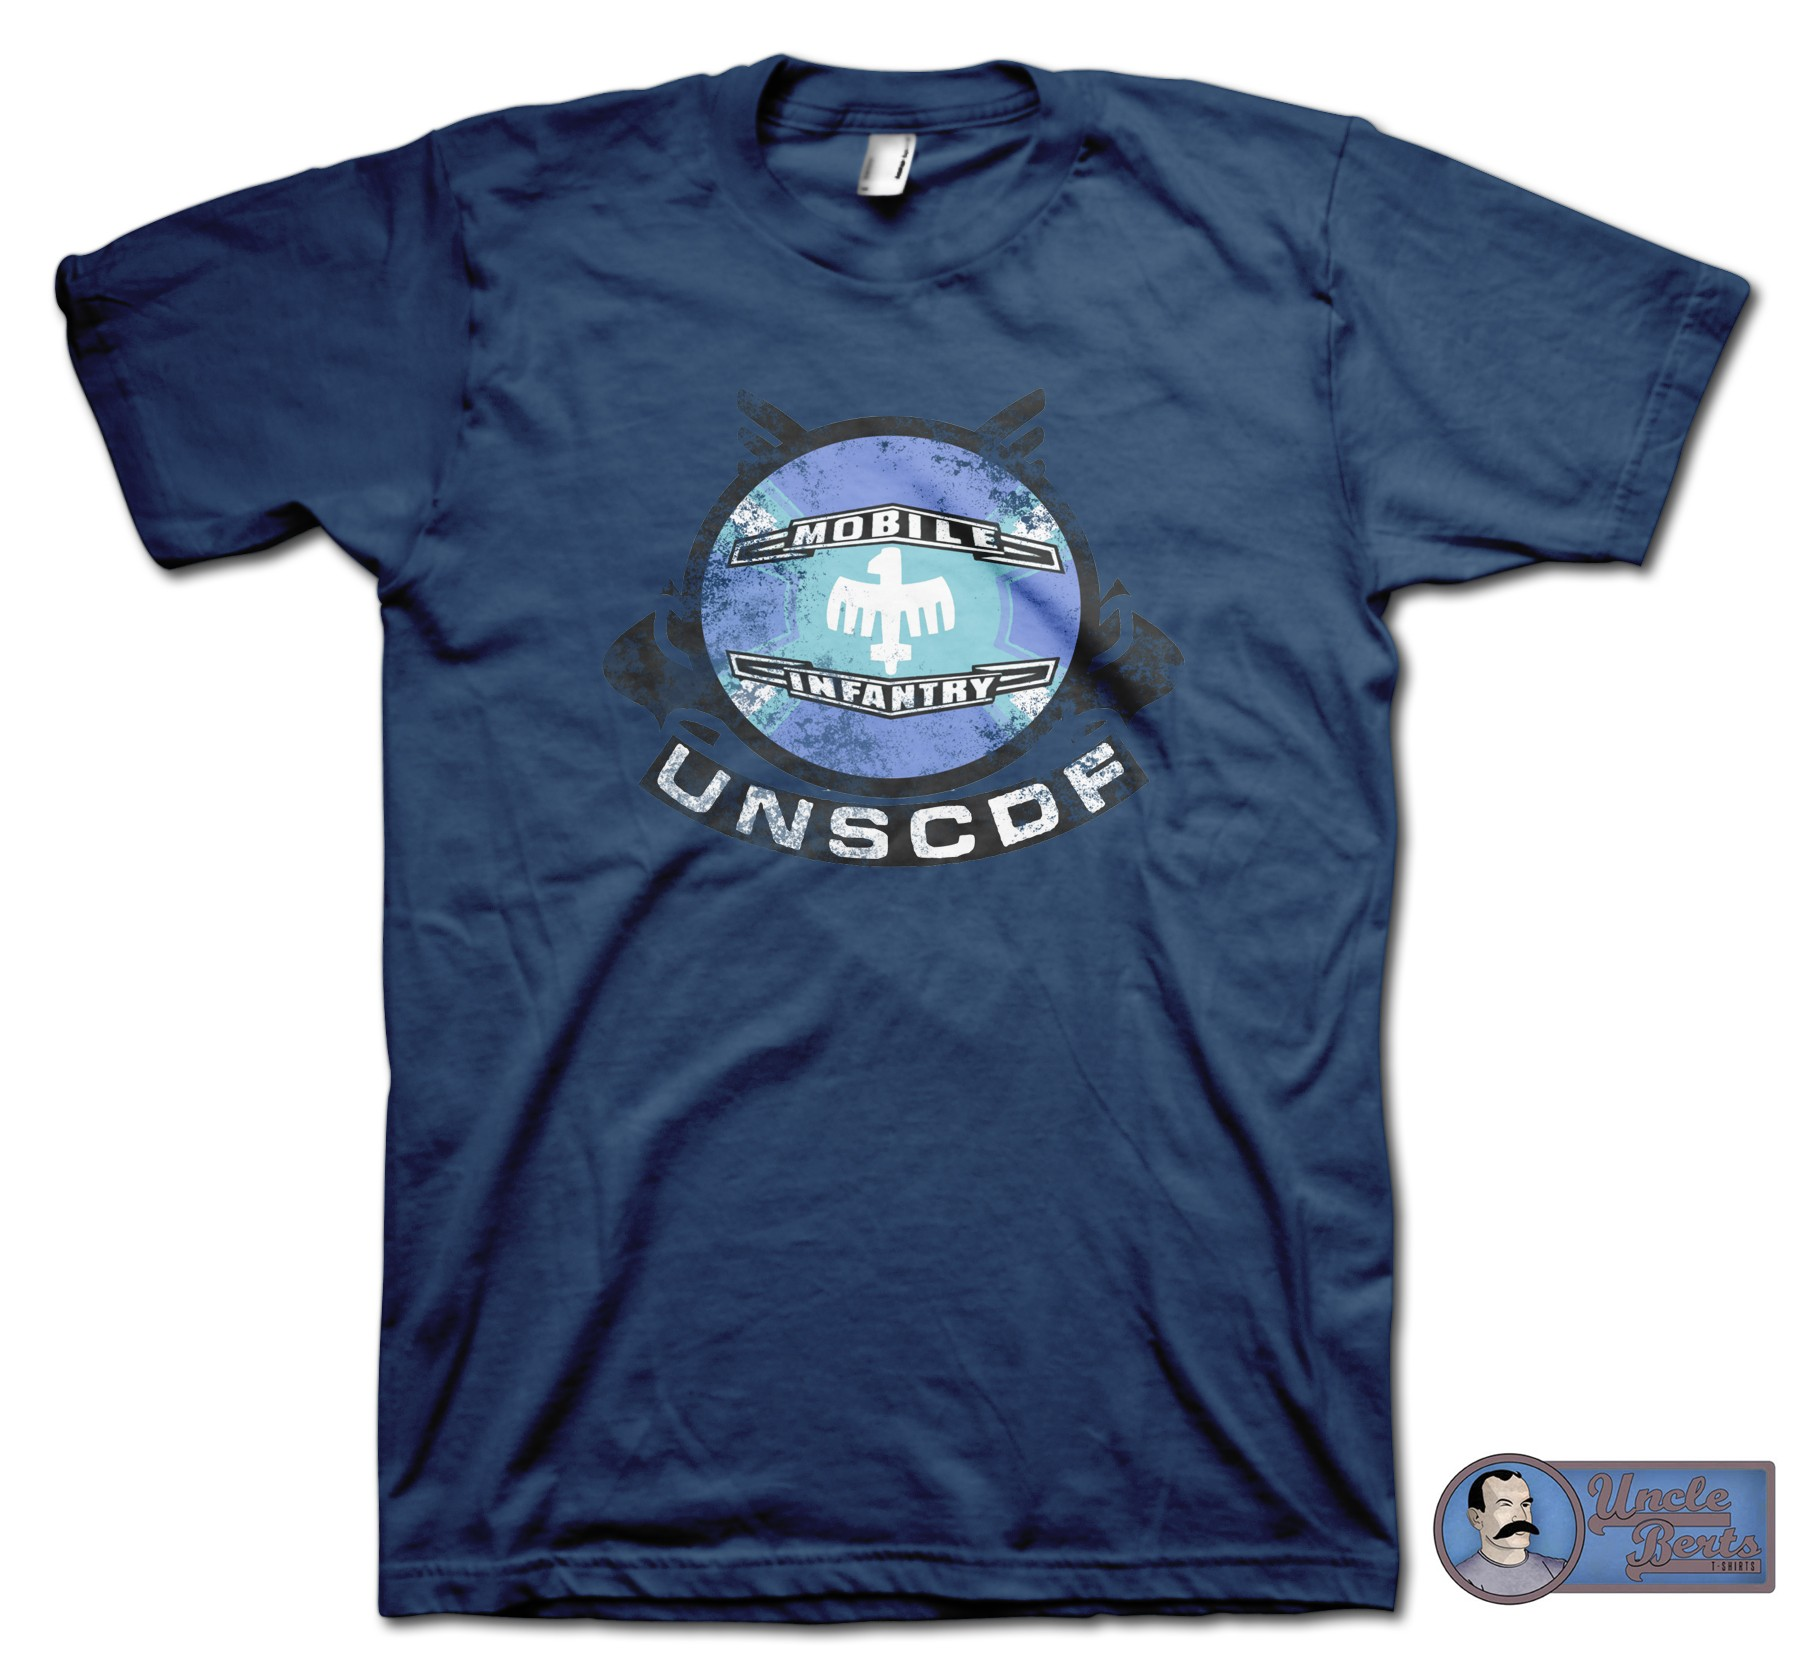 Starship Troopers (1997) inspired Mobile Infantry T-Shirt